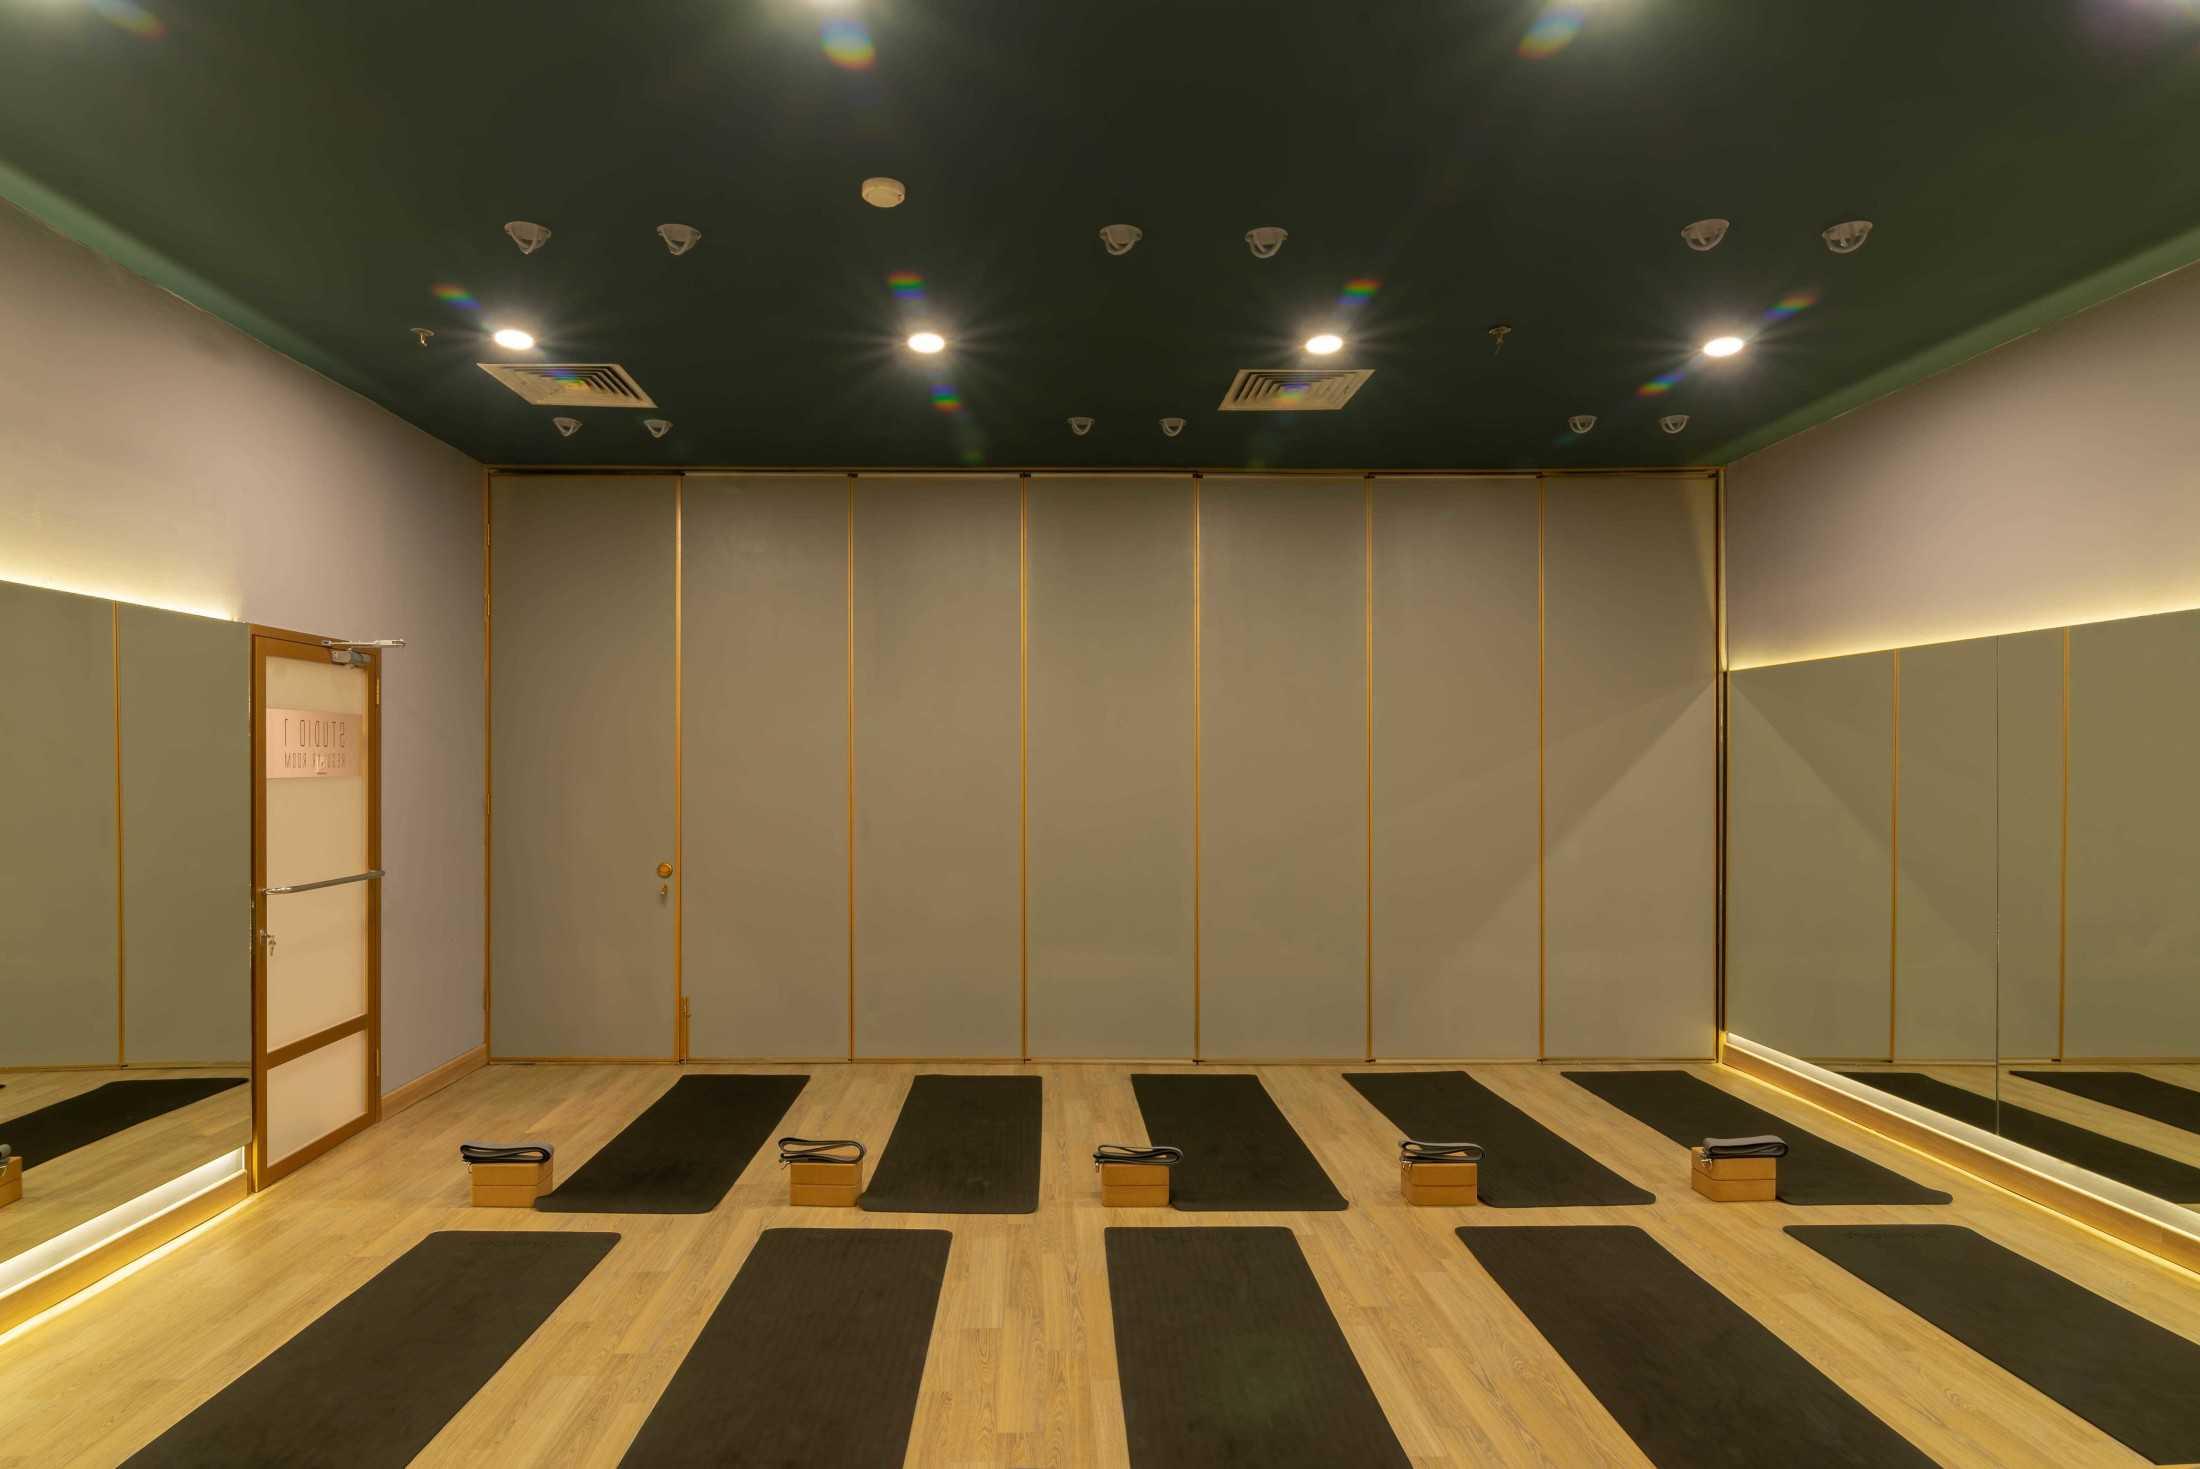 Archid Design&build Star Yoga Kec. Klp. Gading, Kota Jkt Utara, Daerah Khusus Ibukota Jakarta, Indonesia Kec. Klp. Gading, Kota Jkt Utara, Daerah Khusus Ibukota Jakarta, Indonesia Archid-Design-Build-Star-Yoga  88014